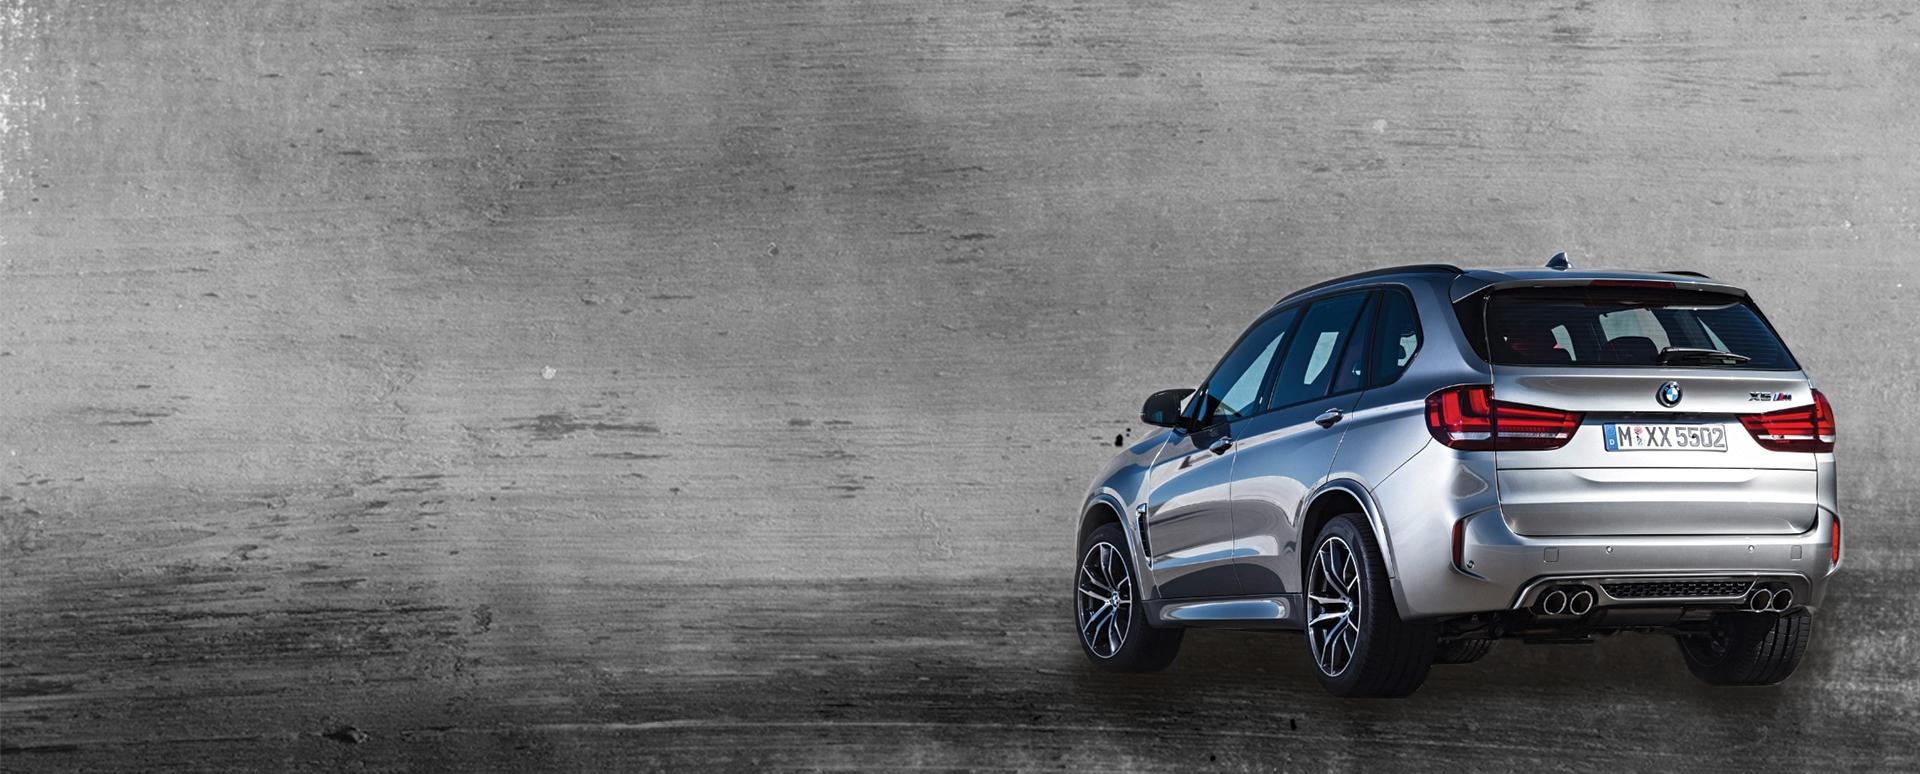 Exoparts inner-page slider: BMW (image)